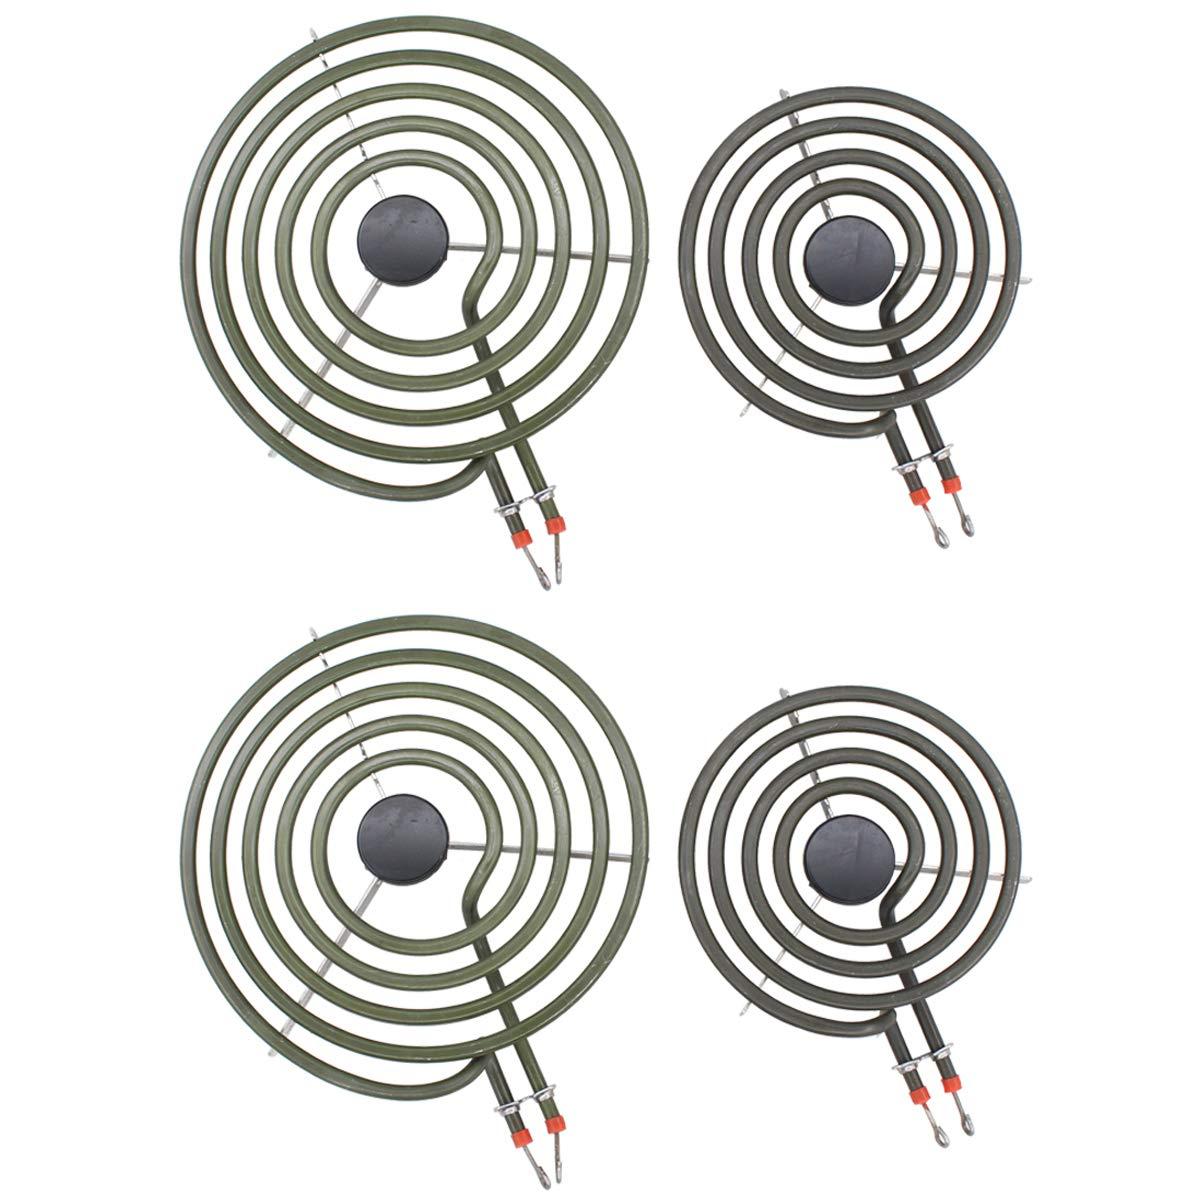 ApplianPar MP22YA Set 2Pcs MP21YA 8 Inch and 2Pcs MP15YA 6 Inch Electric Range Surface Burner Element Coil Unit Kit for Whirlpool KitchenAid Oven Roper